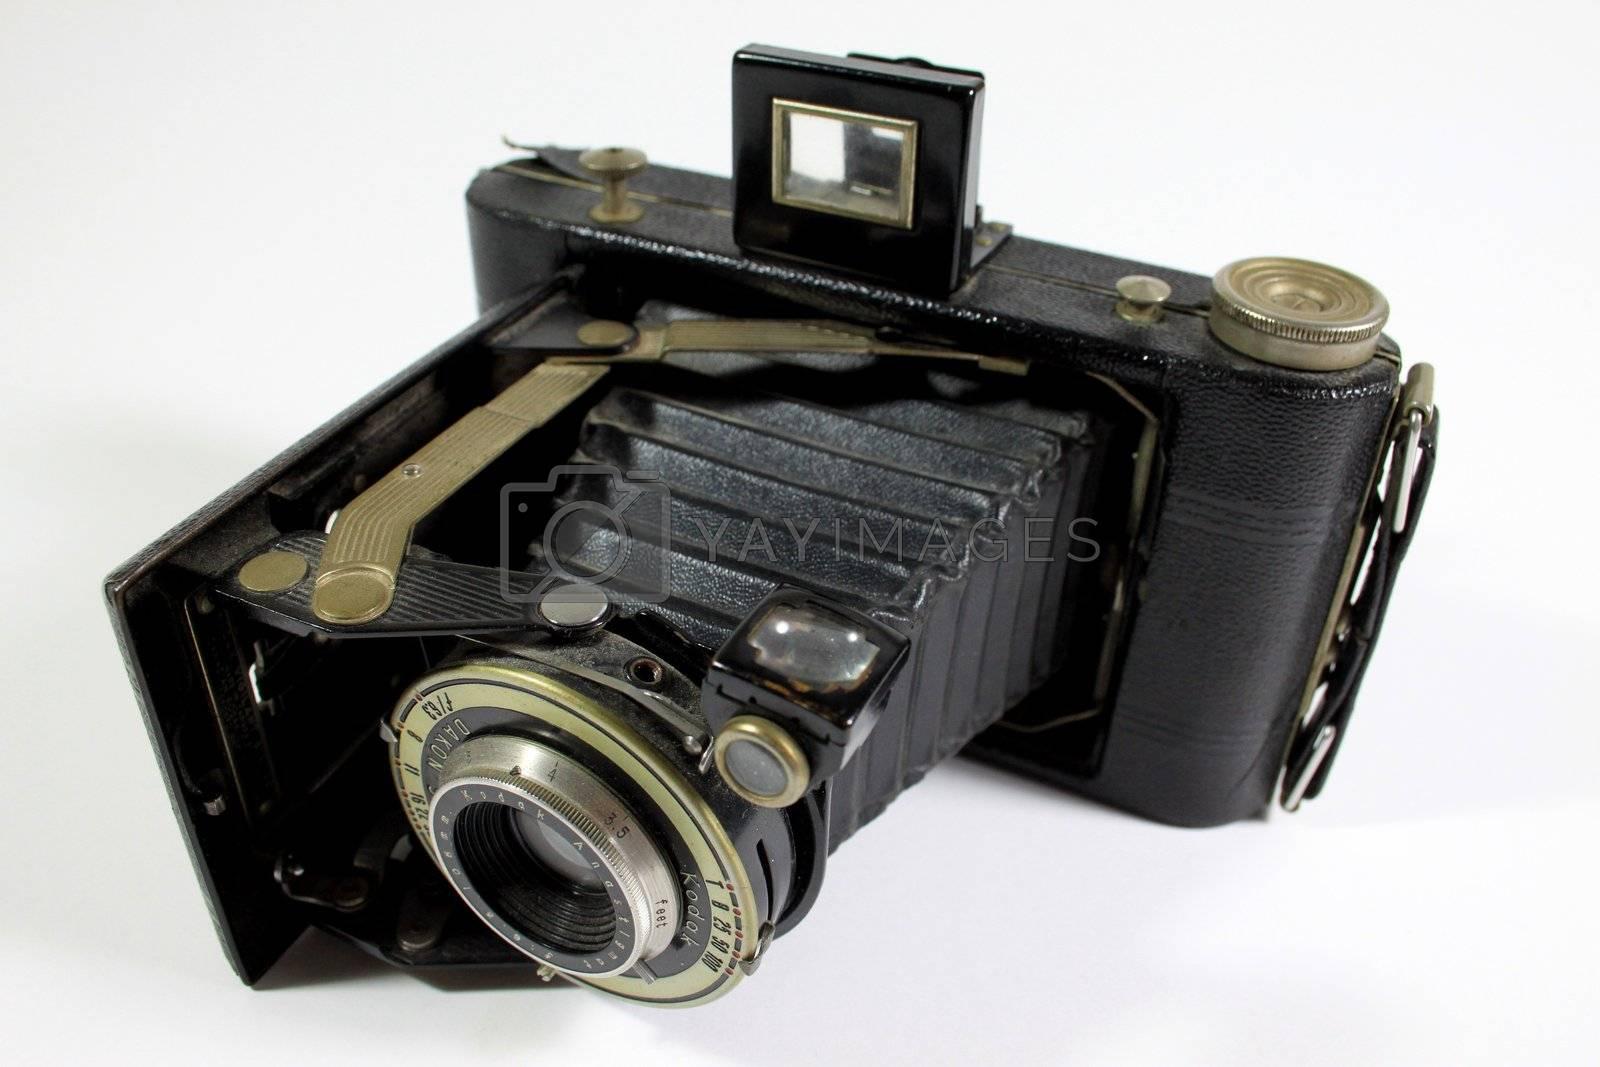 View of old Kodak Astigmatic camera and lense